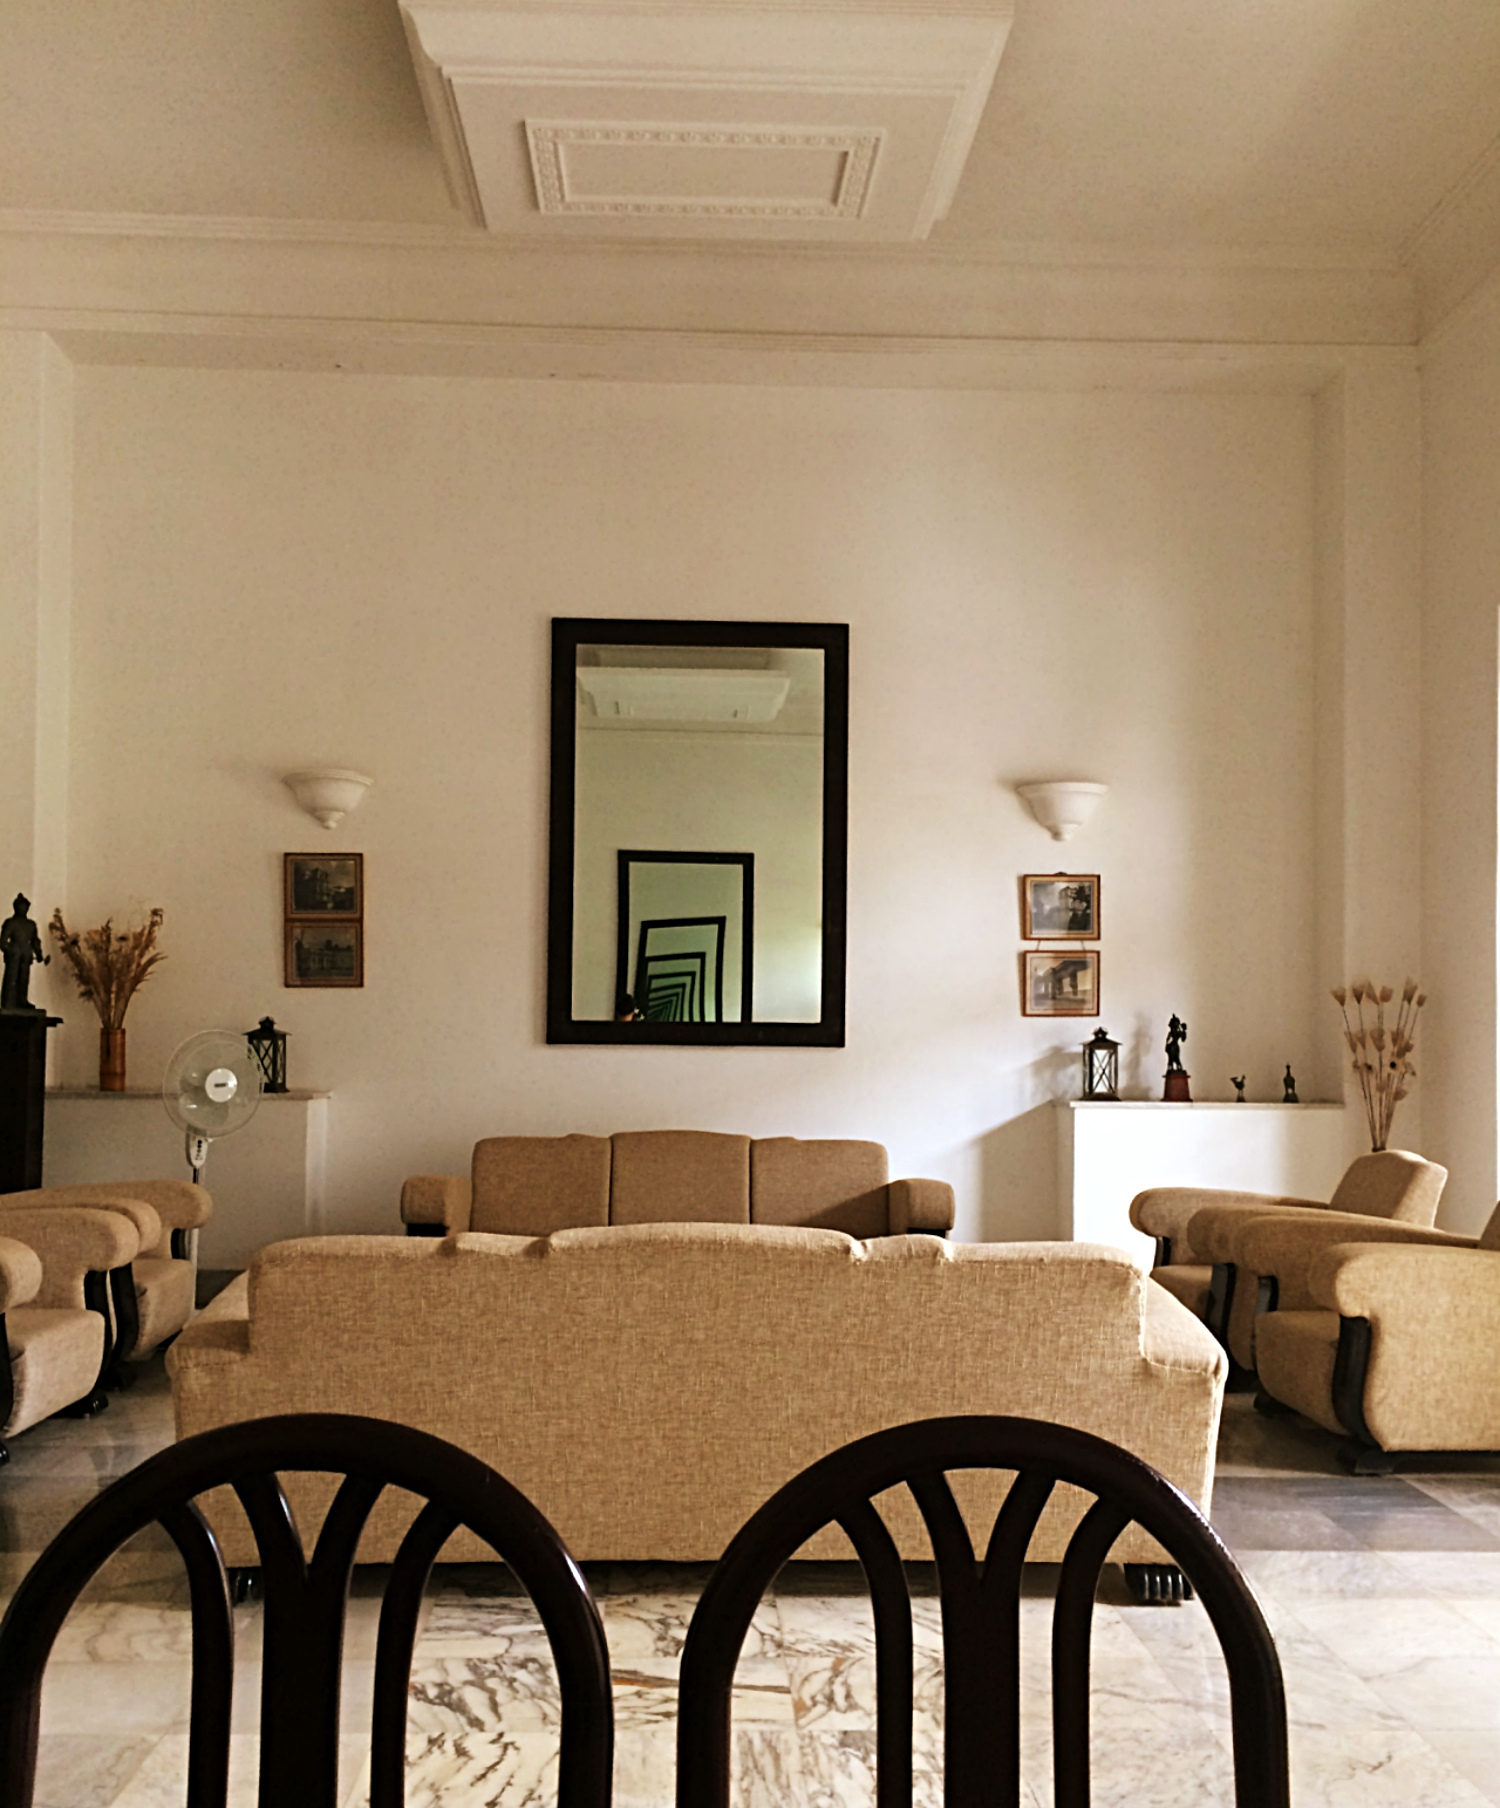 Jhira Bagh Palace Lobby